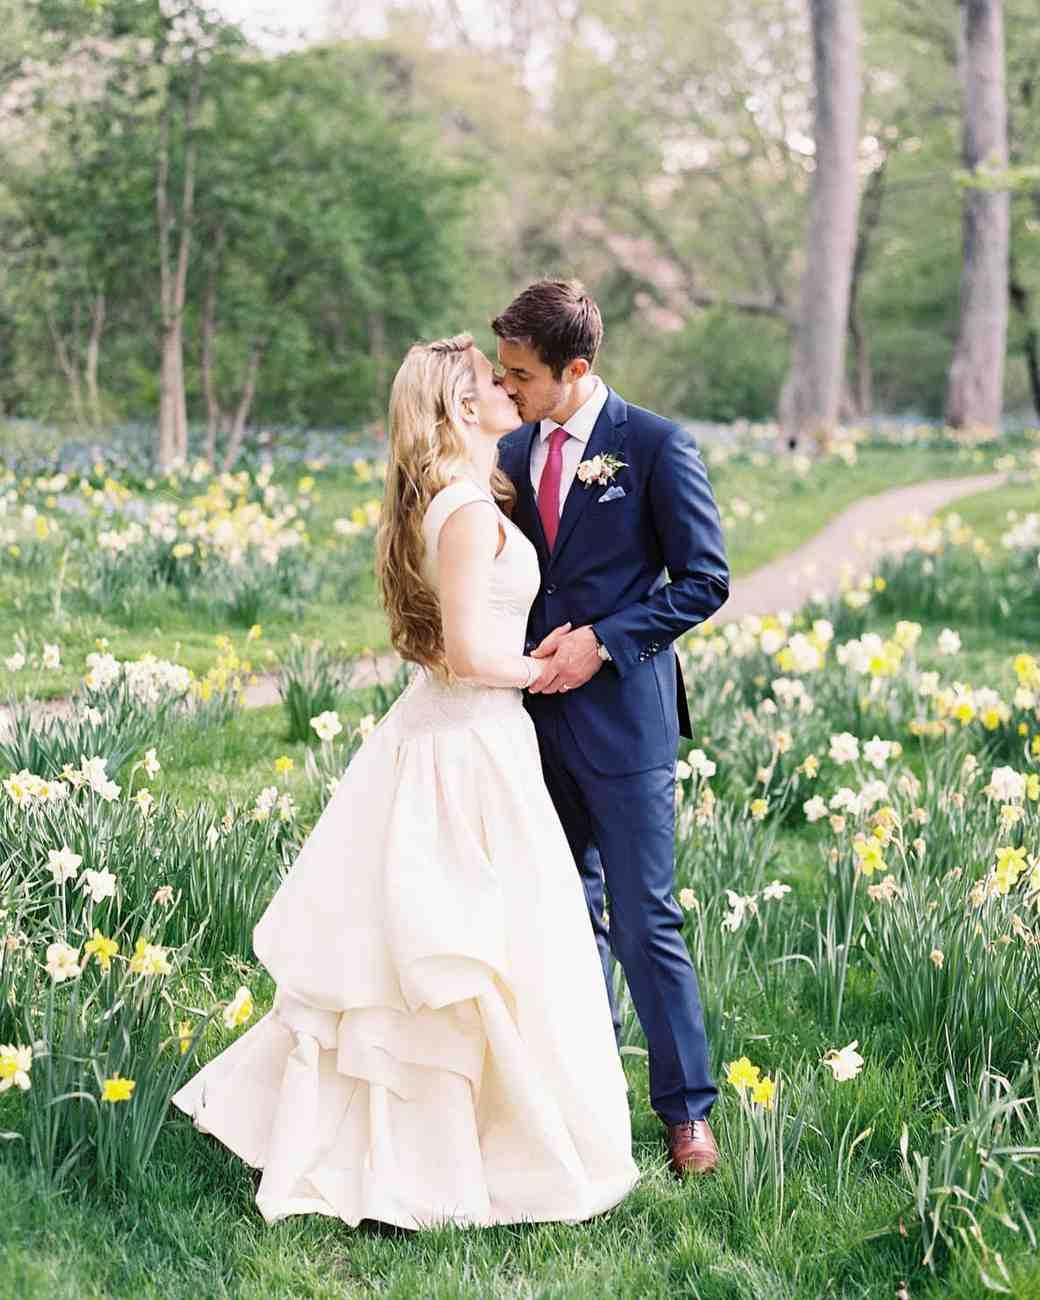 nikki-kiff-wedding-couple-004775011-s112766-0316.jpg